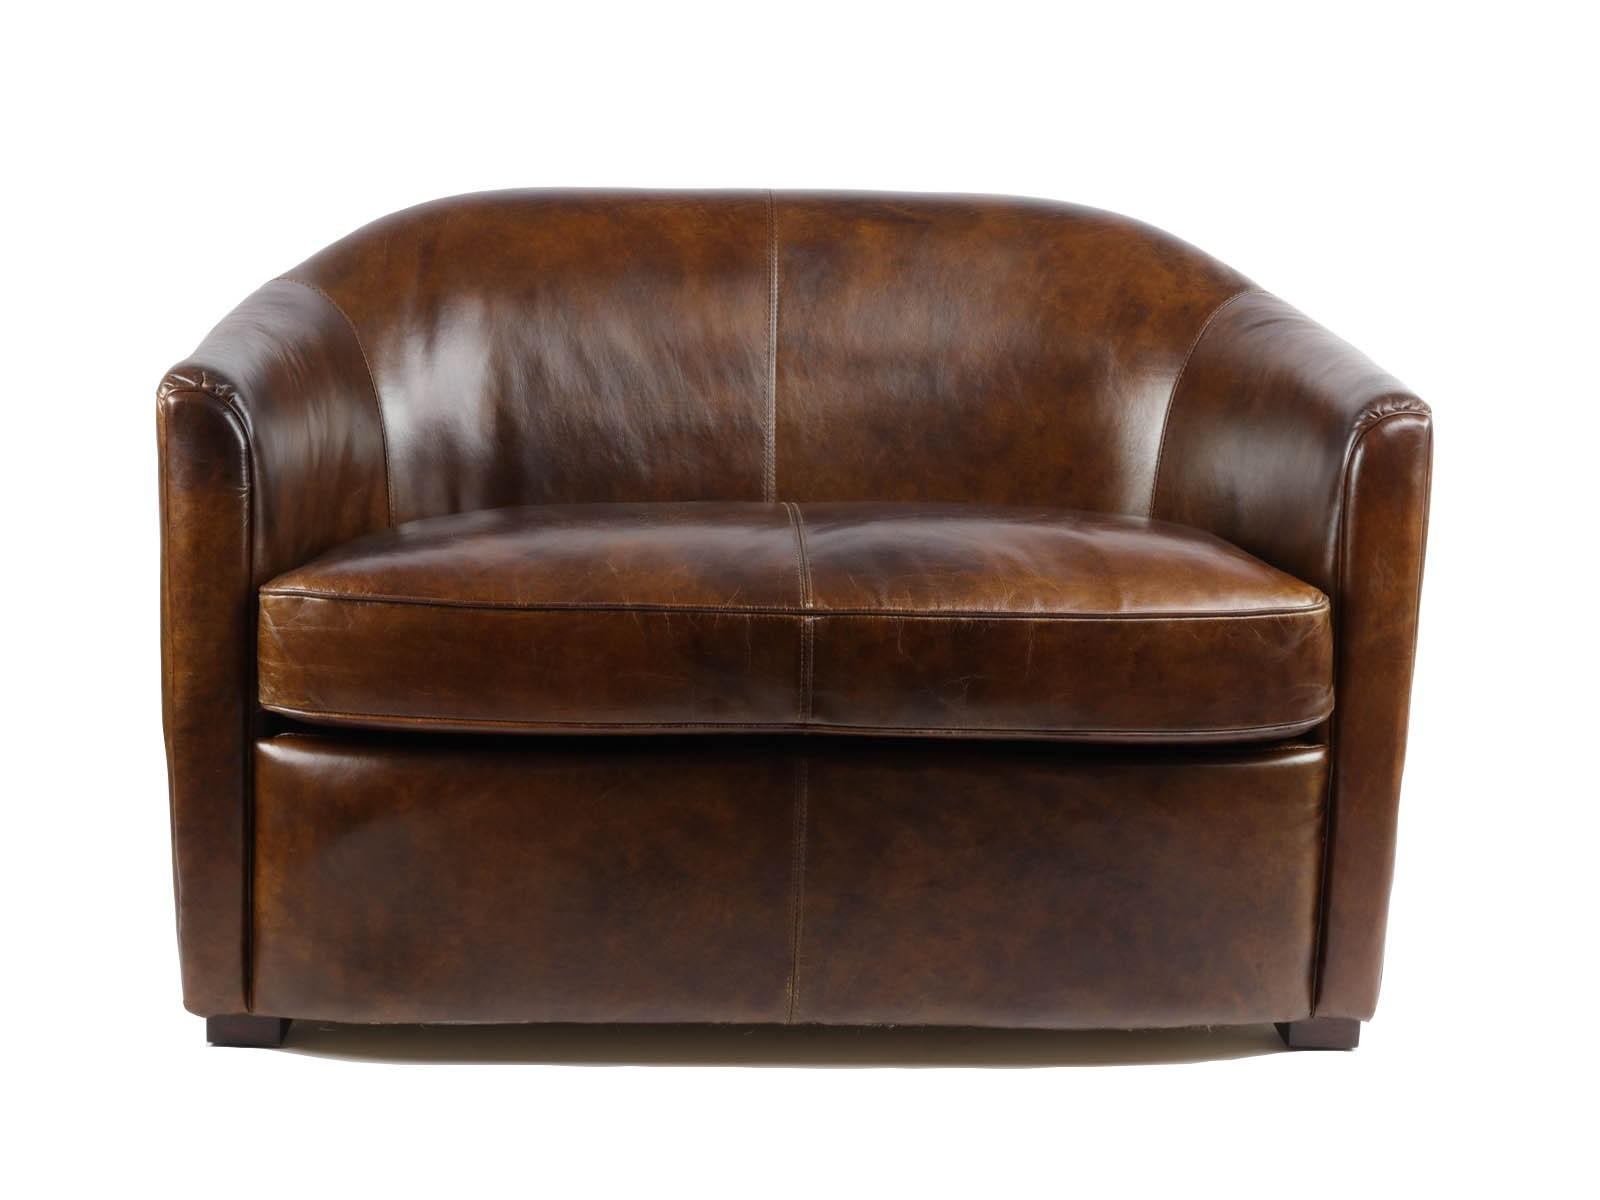 Inspirational Canapé Cuir Marron Vintage